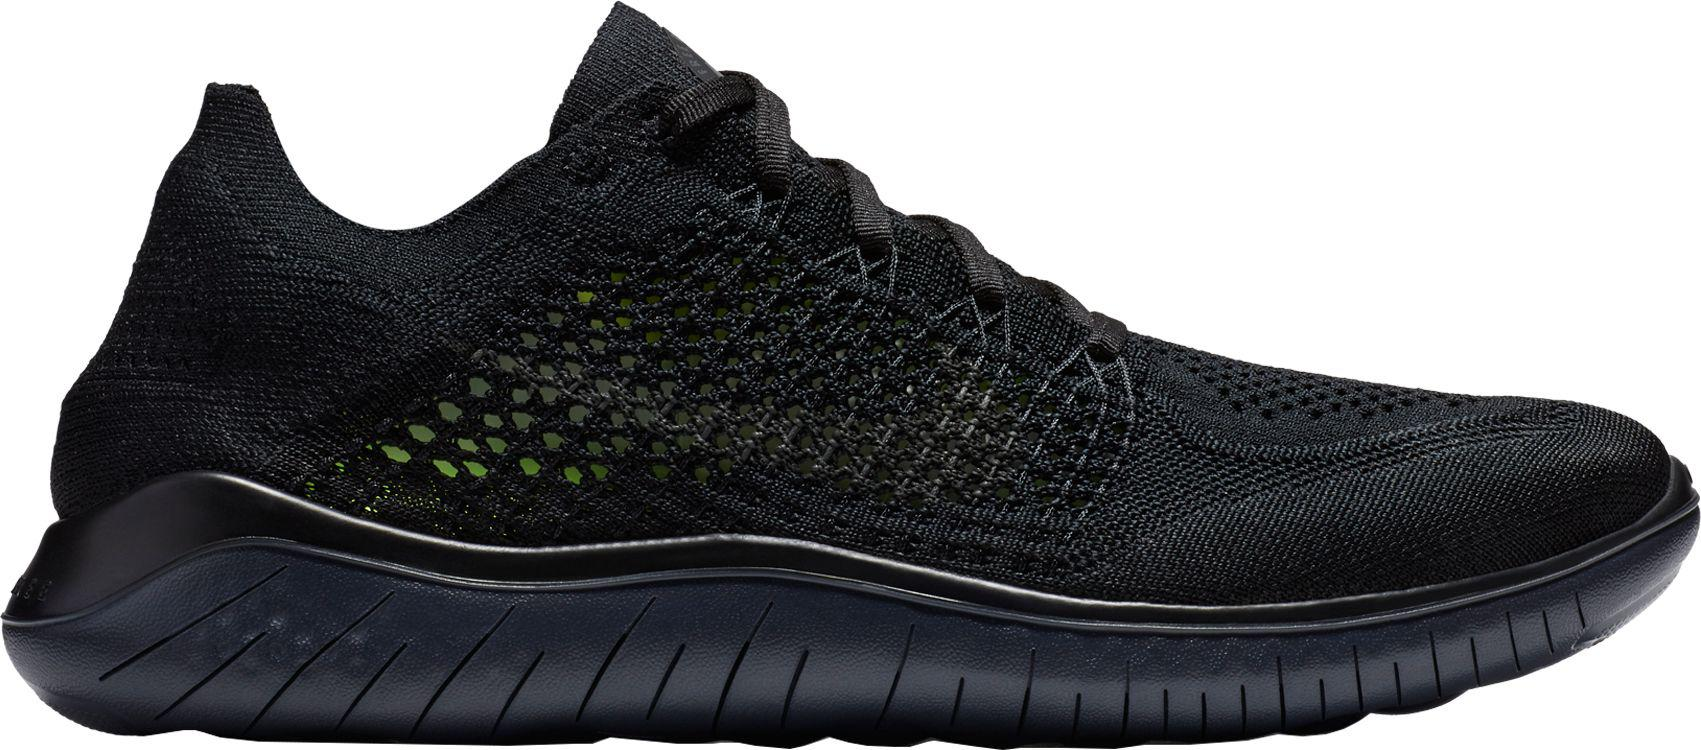 3731fef53b572 Lyst - Nike Free Rn Flyknit 2018 Running Shoes in Black for Men